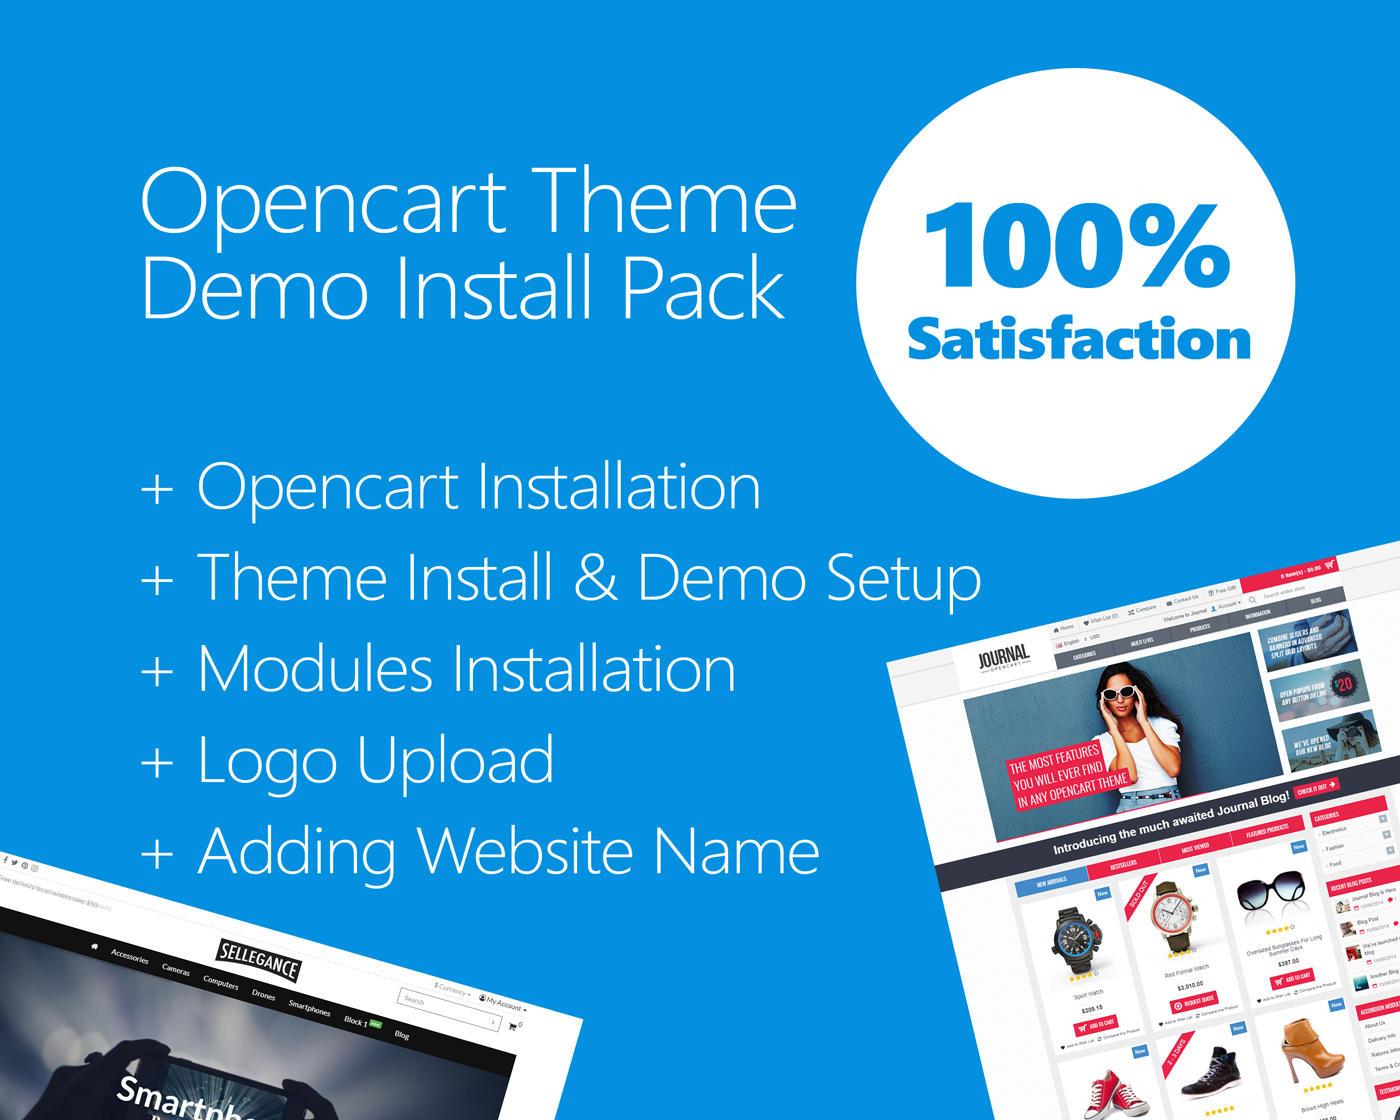 OpenCart Theme Install & Demo Setup (+ Plugin & Logo Setup) by hasanet - 109817